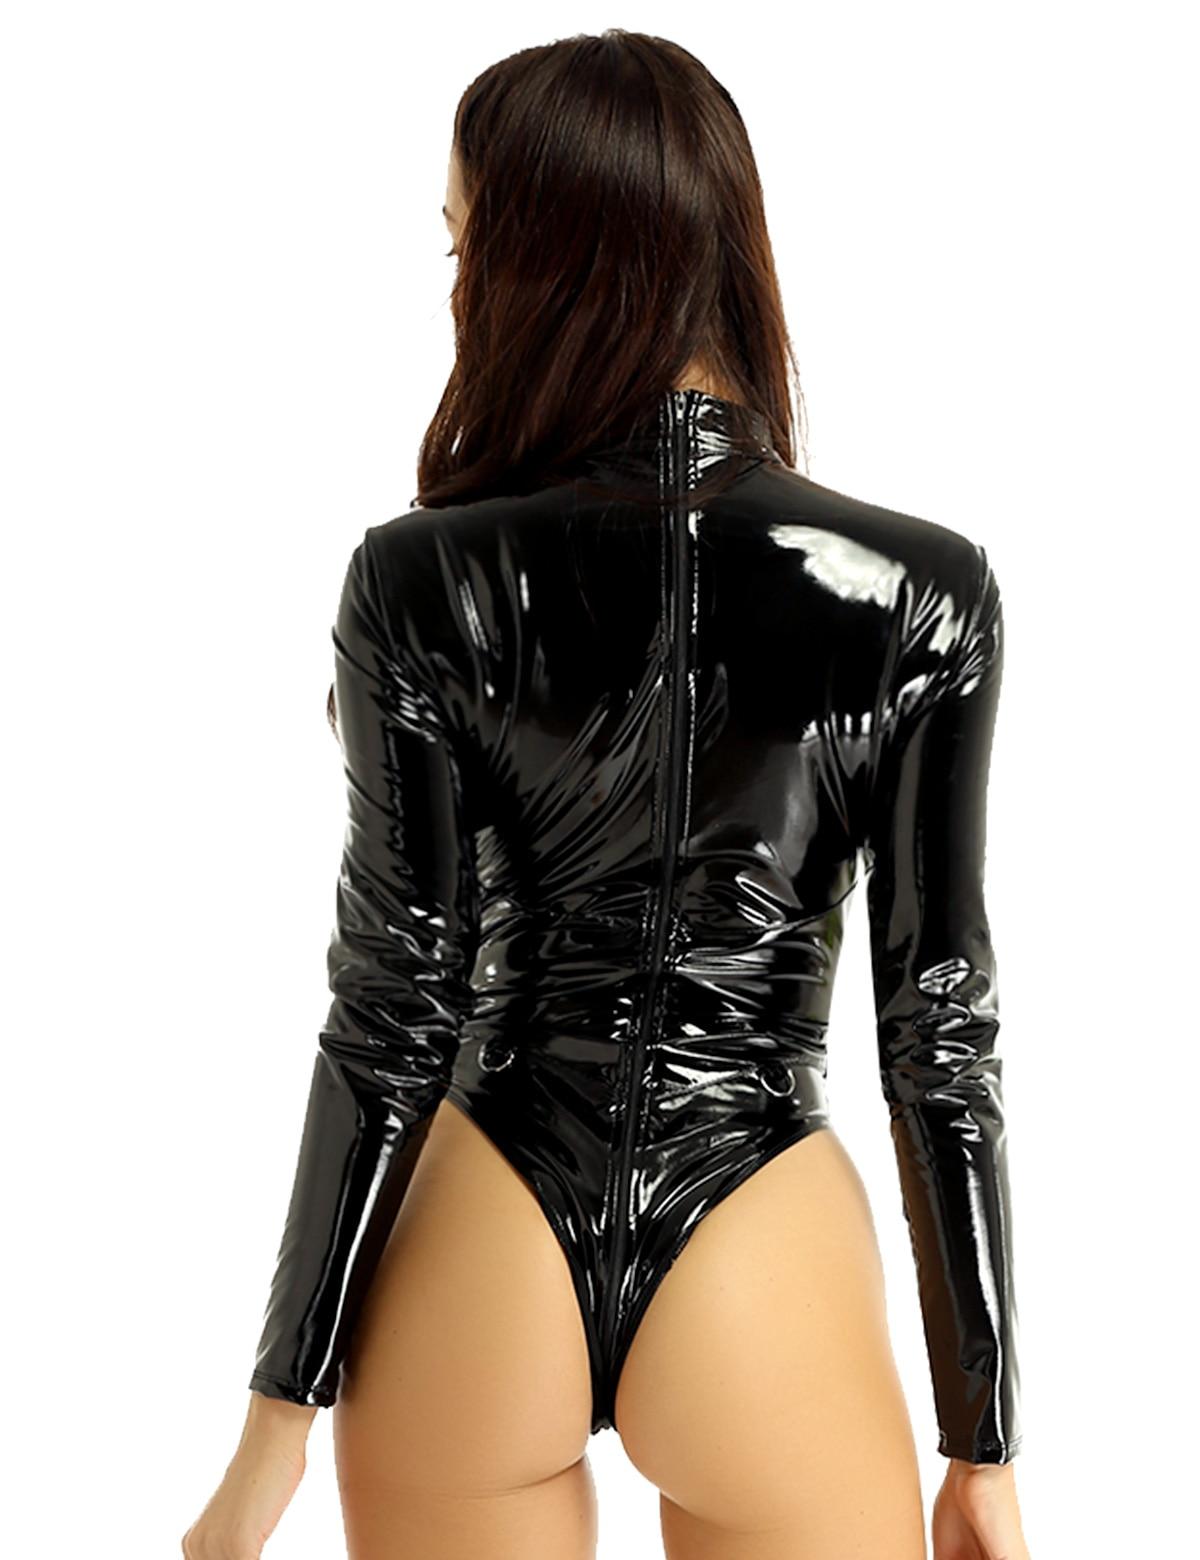 Image 3 - MSemis Women Wetlook Patent Leather Lingerie Body Sexy Catsuit High Collar Double Zipper Open Crotch Leotard Bodysuit NightwearTeddies & Bodysuits   -